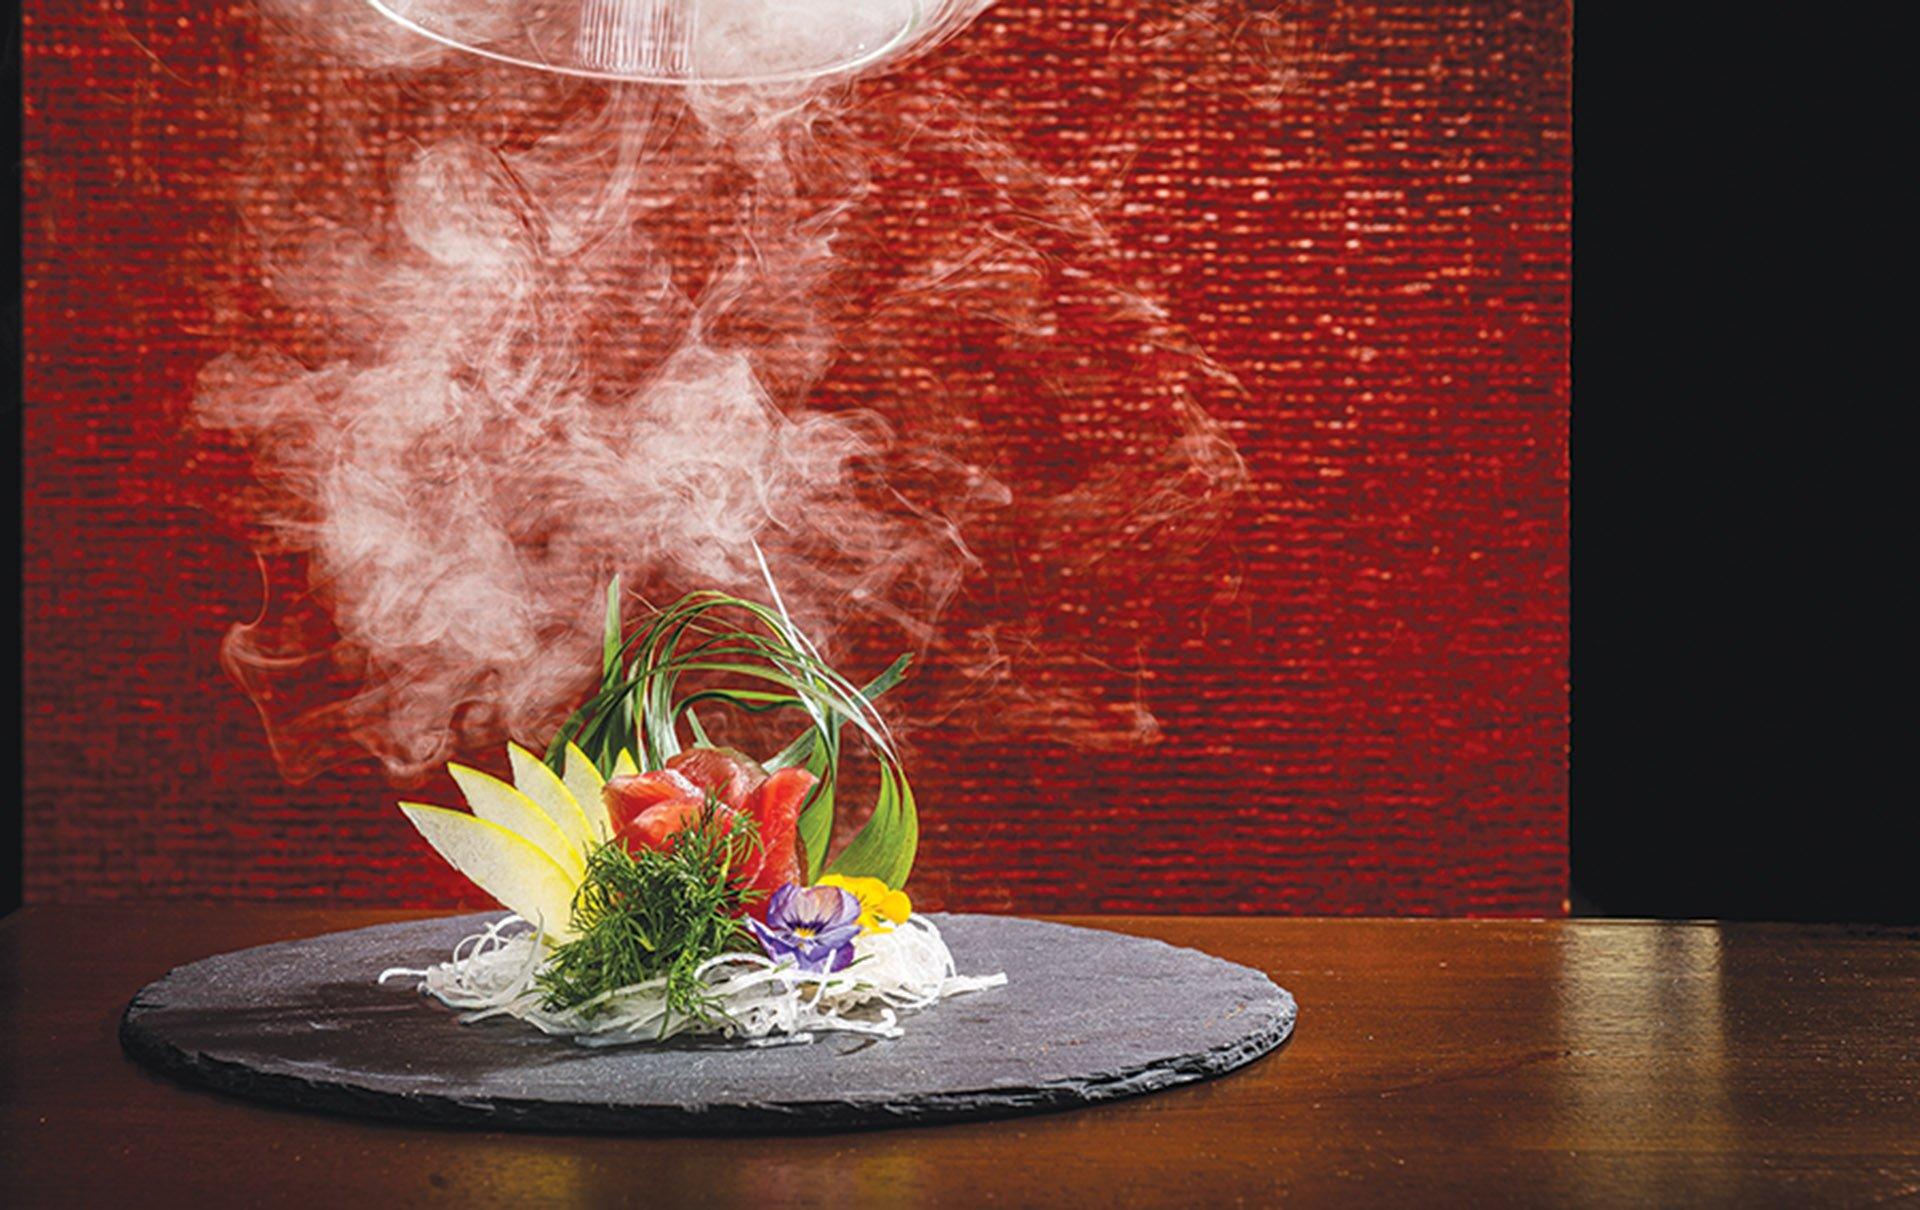 Nara-Ya smoked zuke tuna